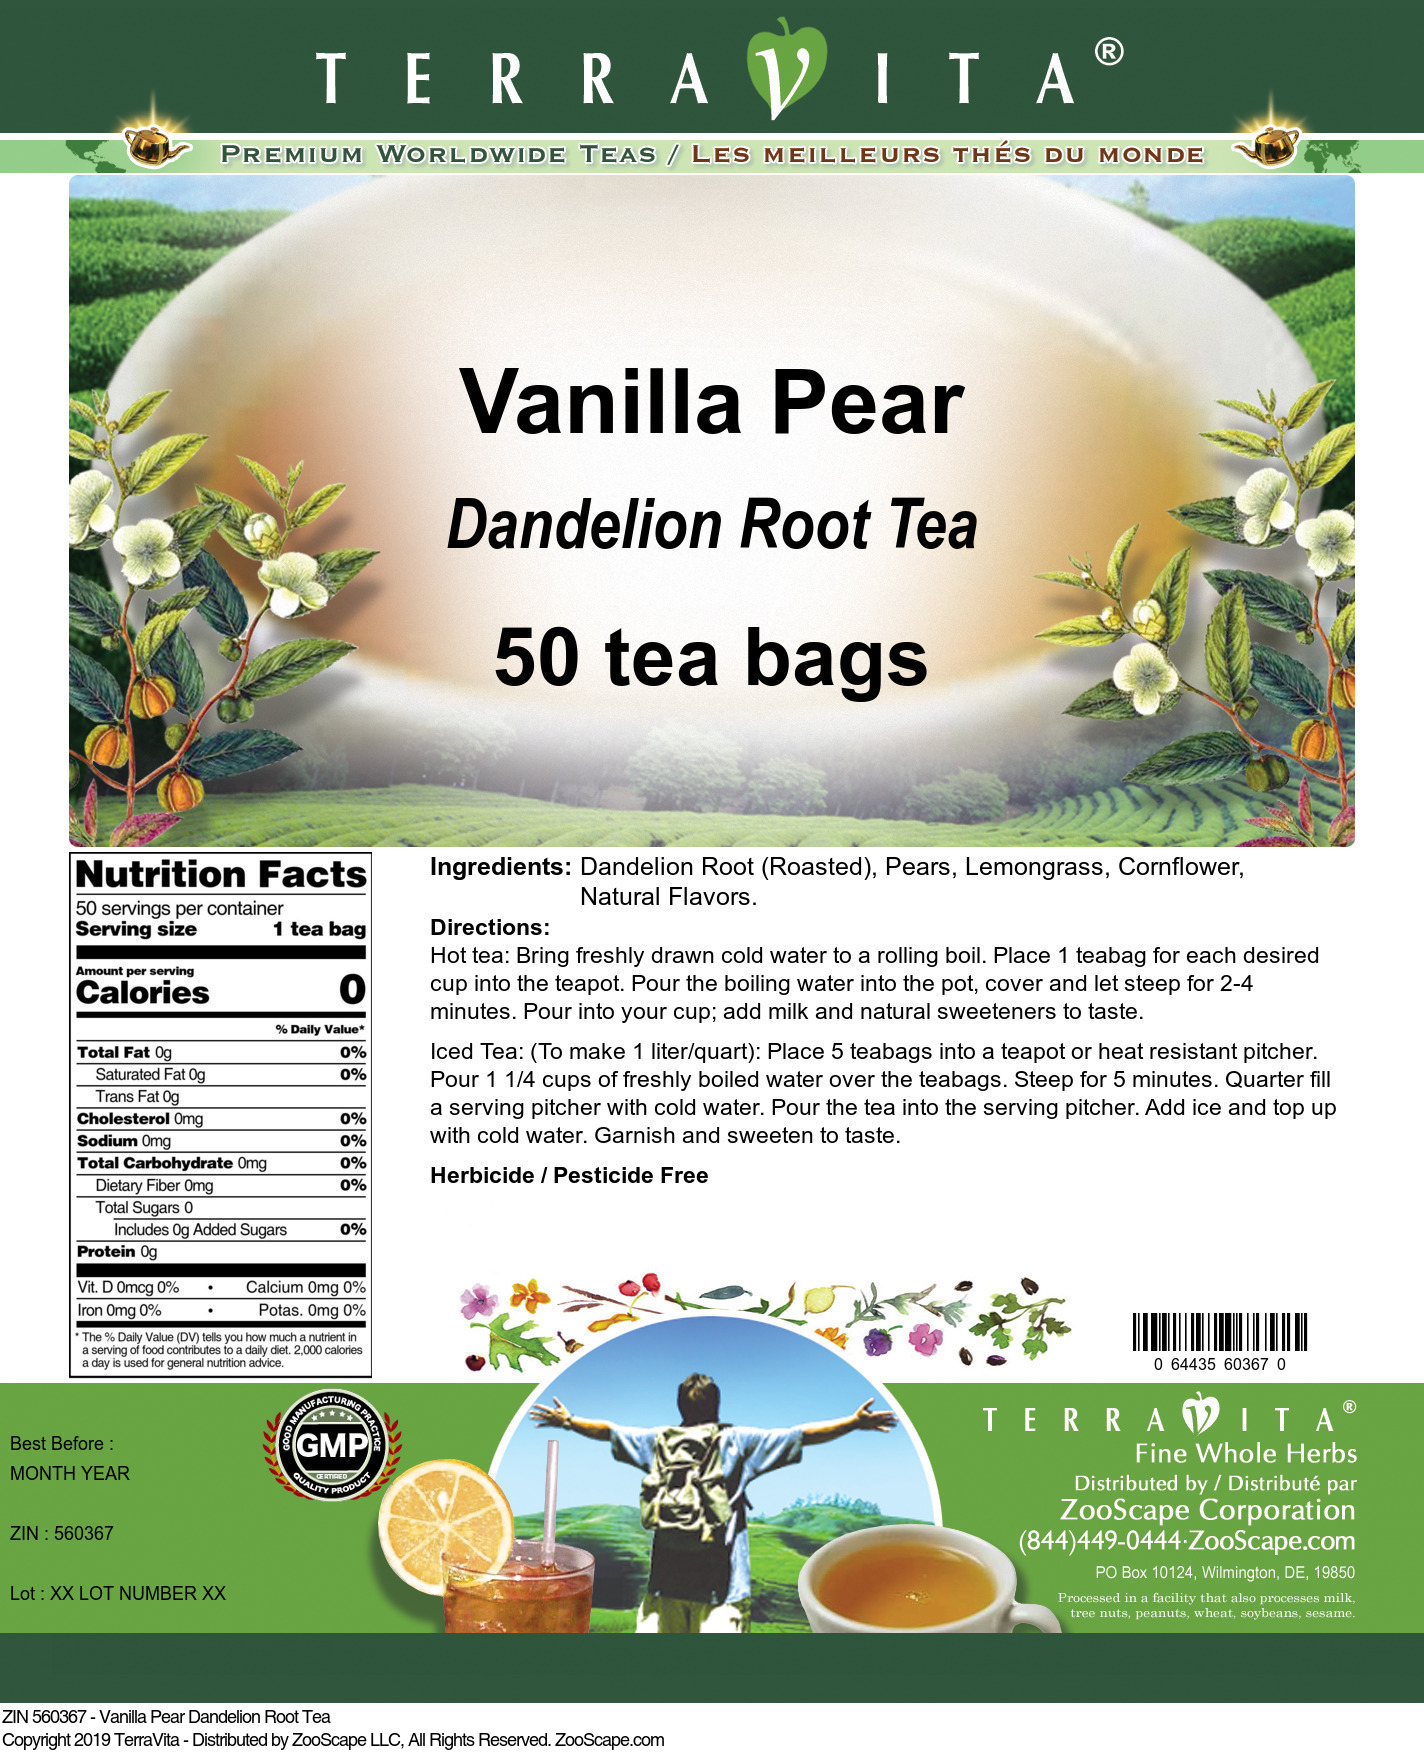 Vanilla Pear Dandelion Root